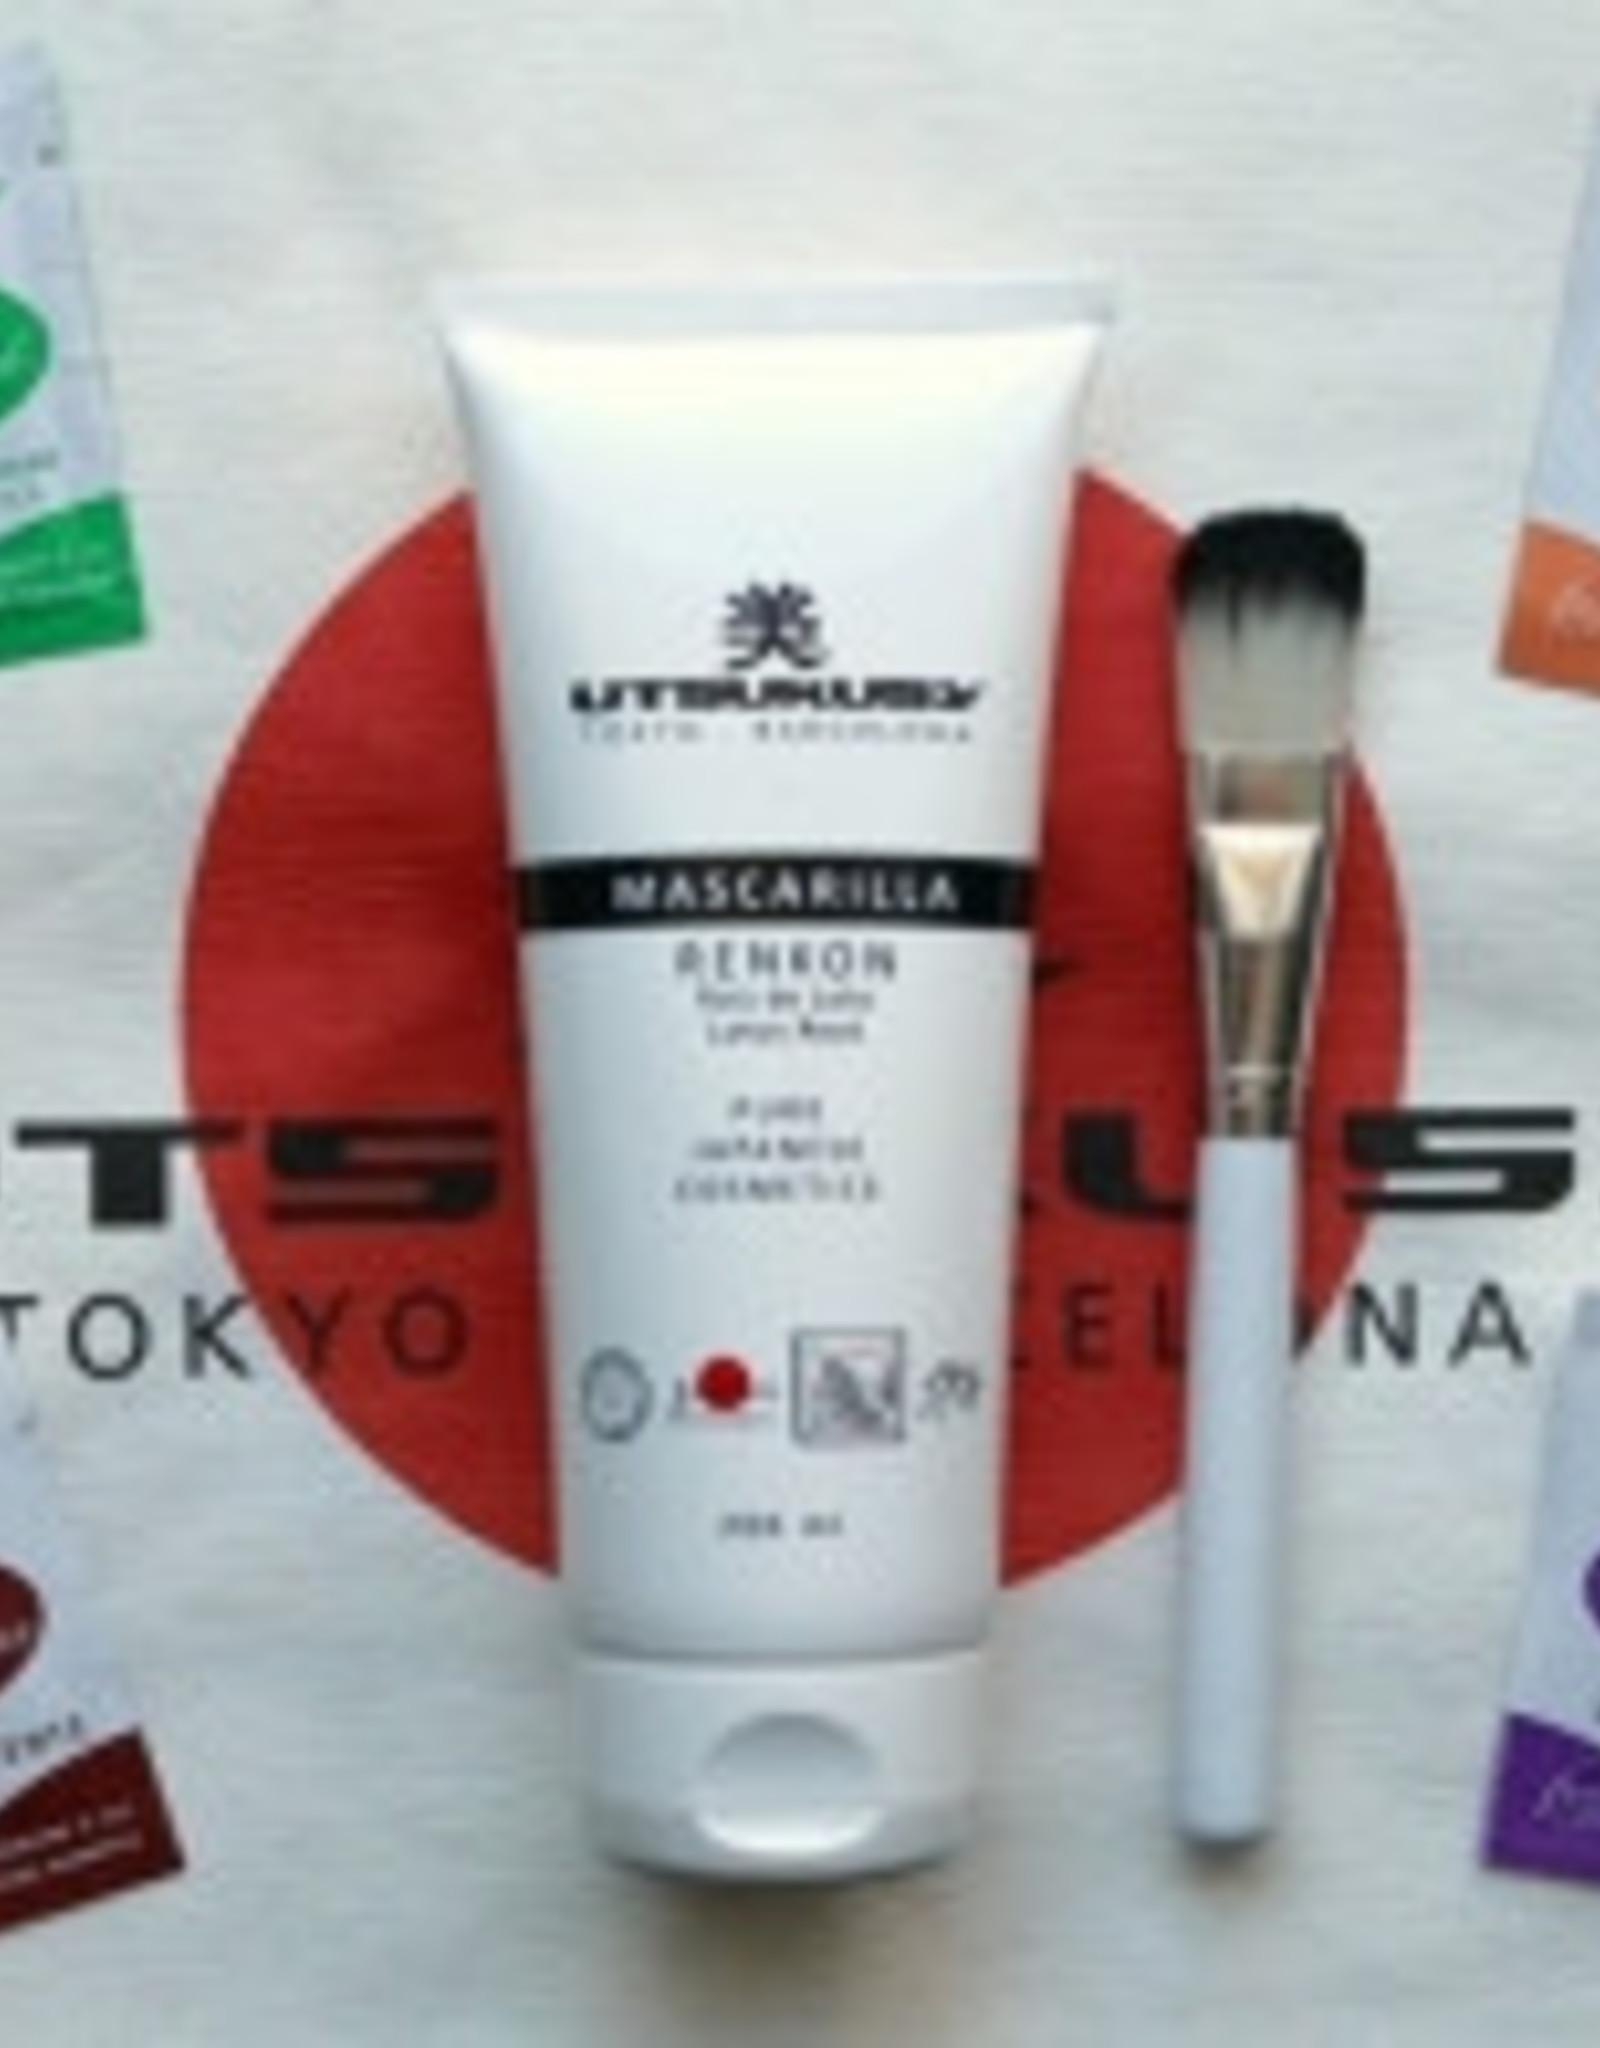 Utsukusy Shashimi Renkon facial mask